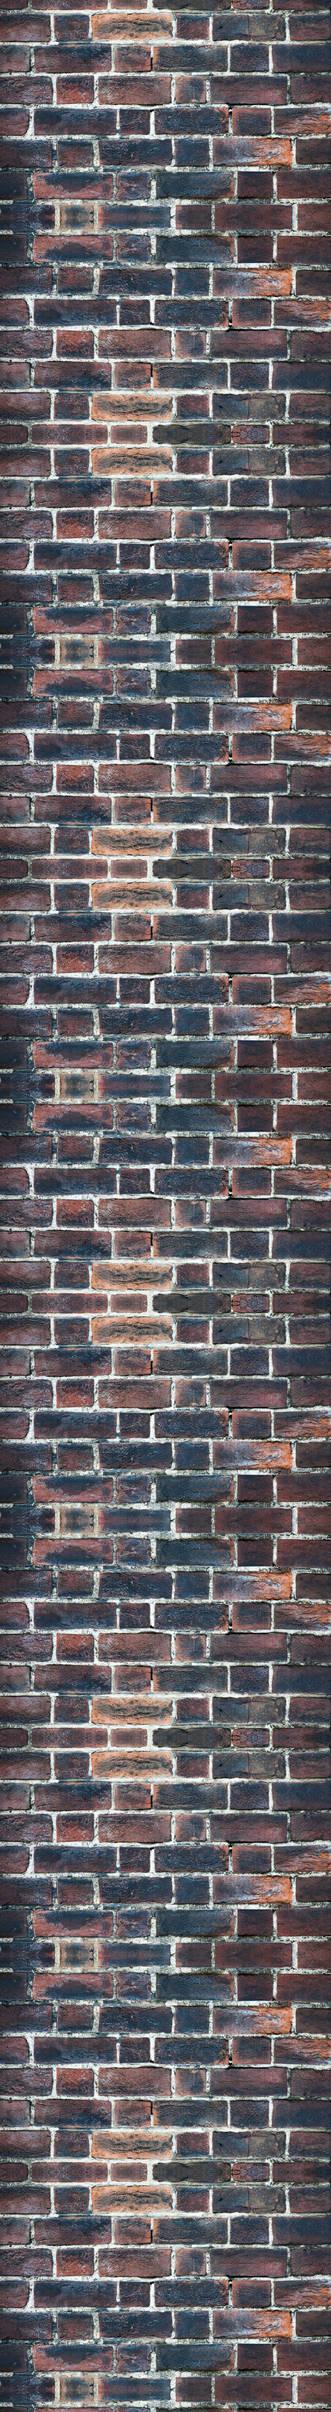 Brick 3 Custom Box [Free to Use]